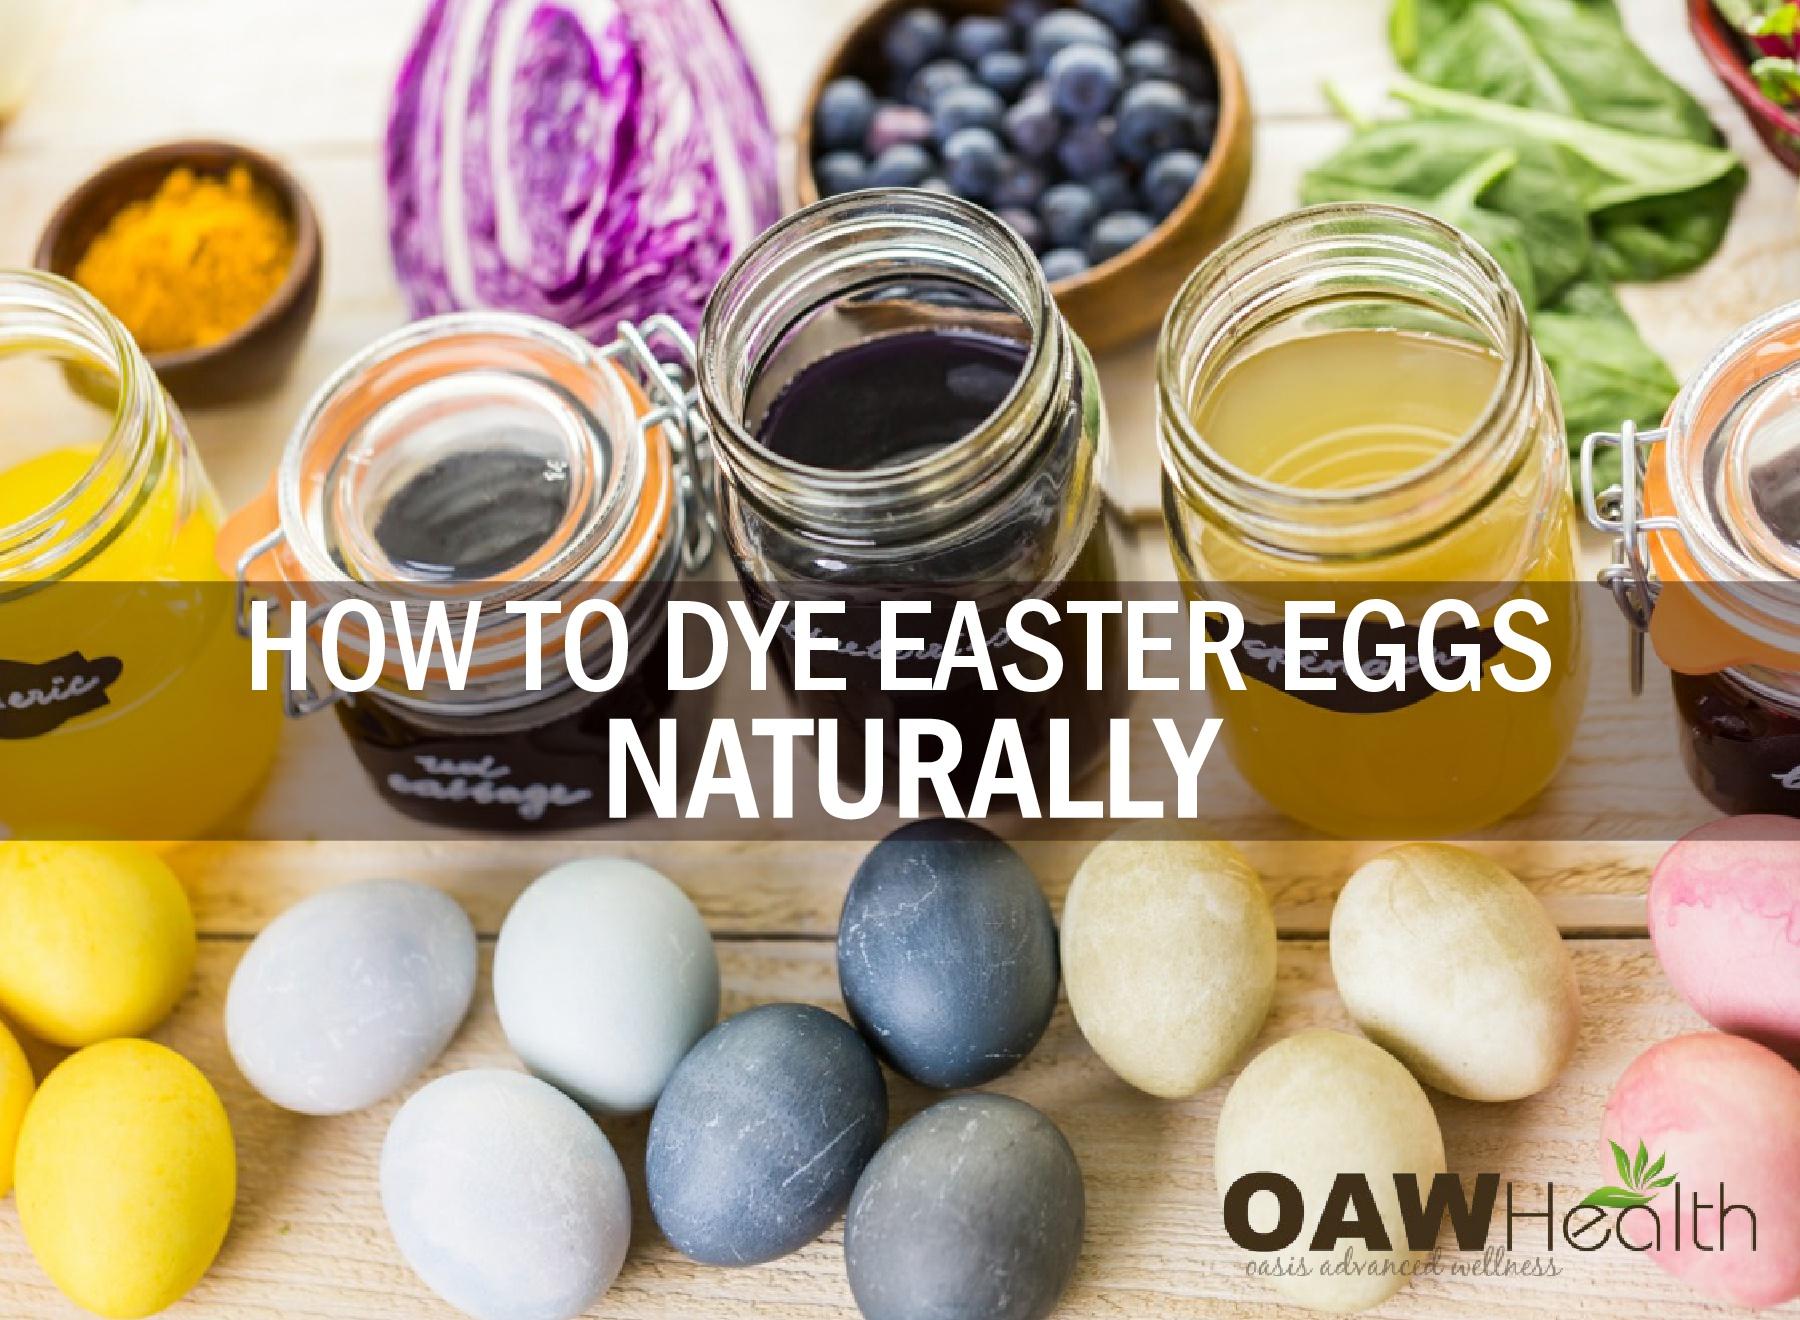 DIY Natural Dyes for Easter Eggs